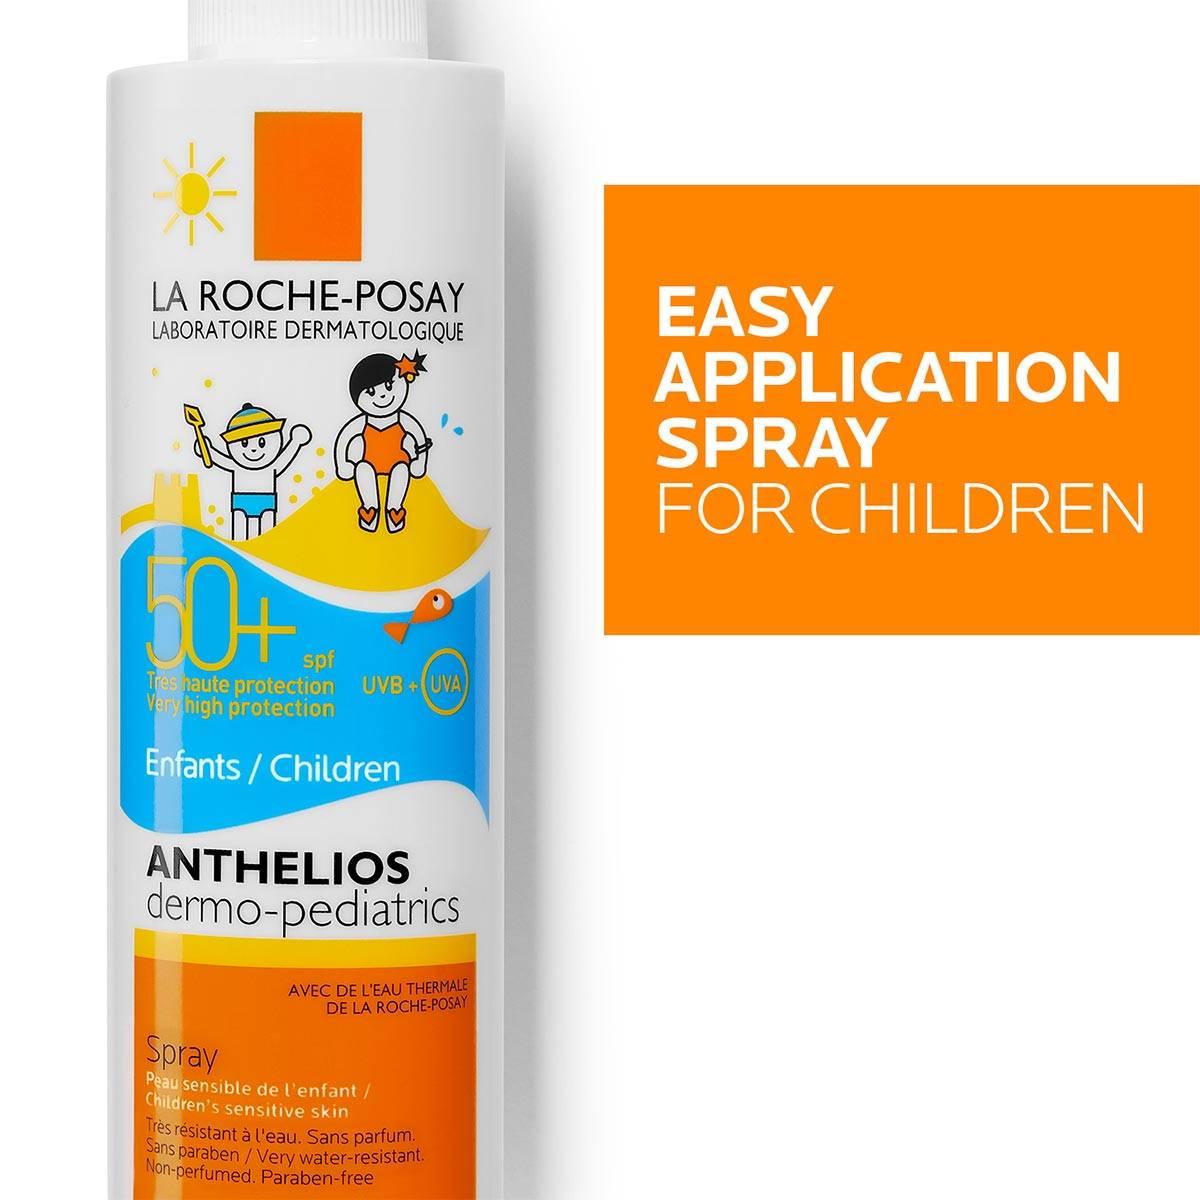 La Roche Posay ProduktSide Sol Anthelios DP Spray Spf50 200ml 33378724